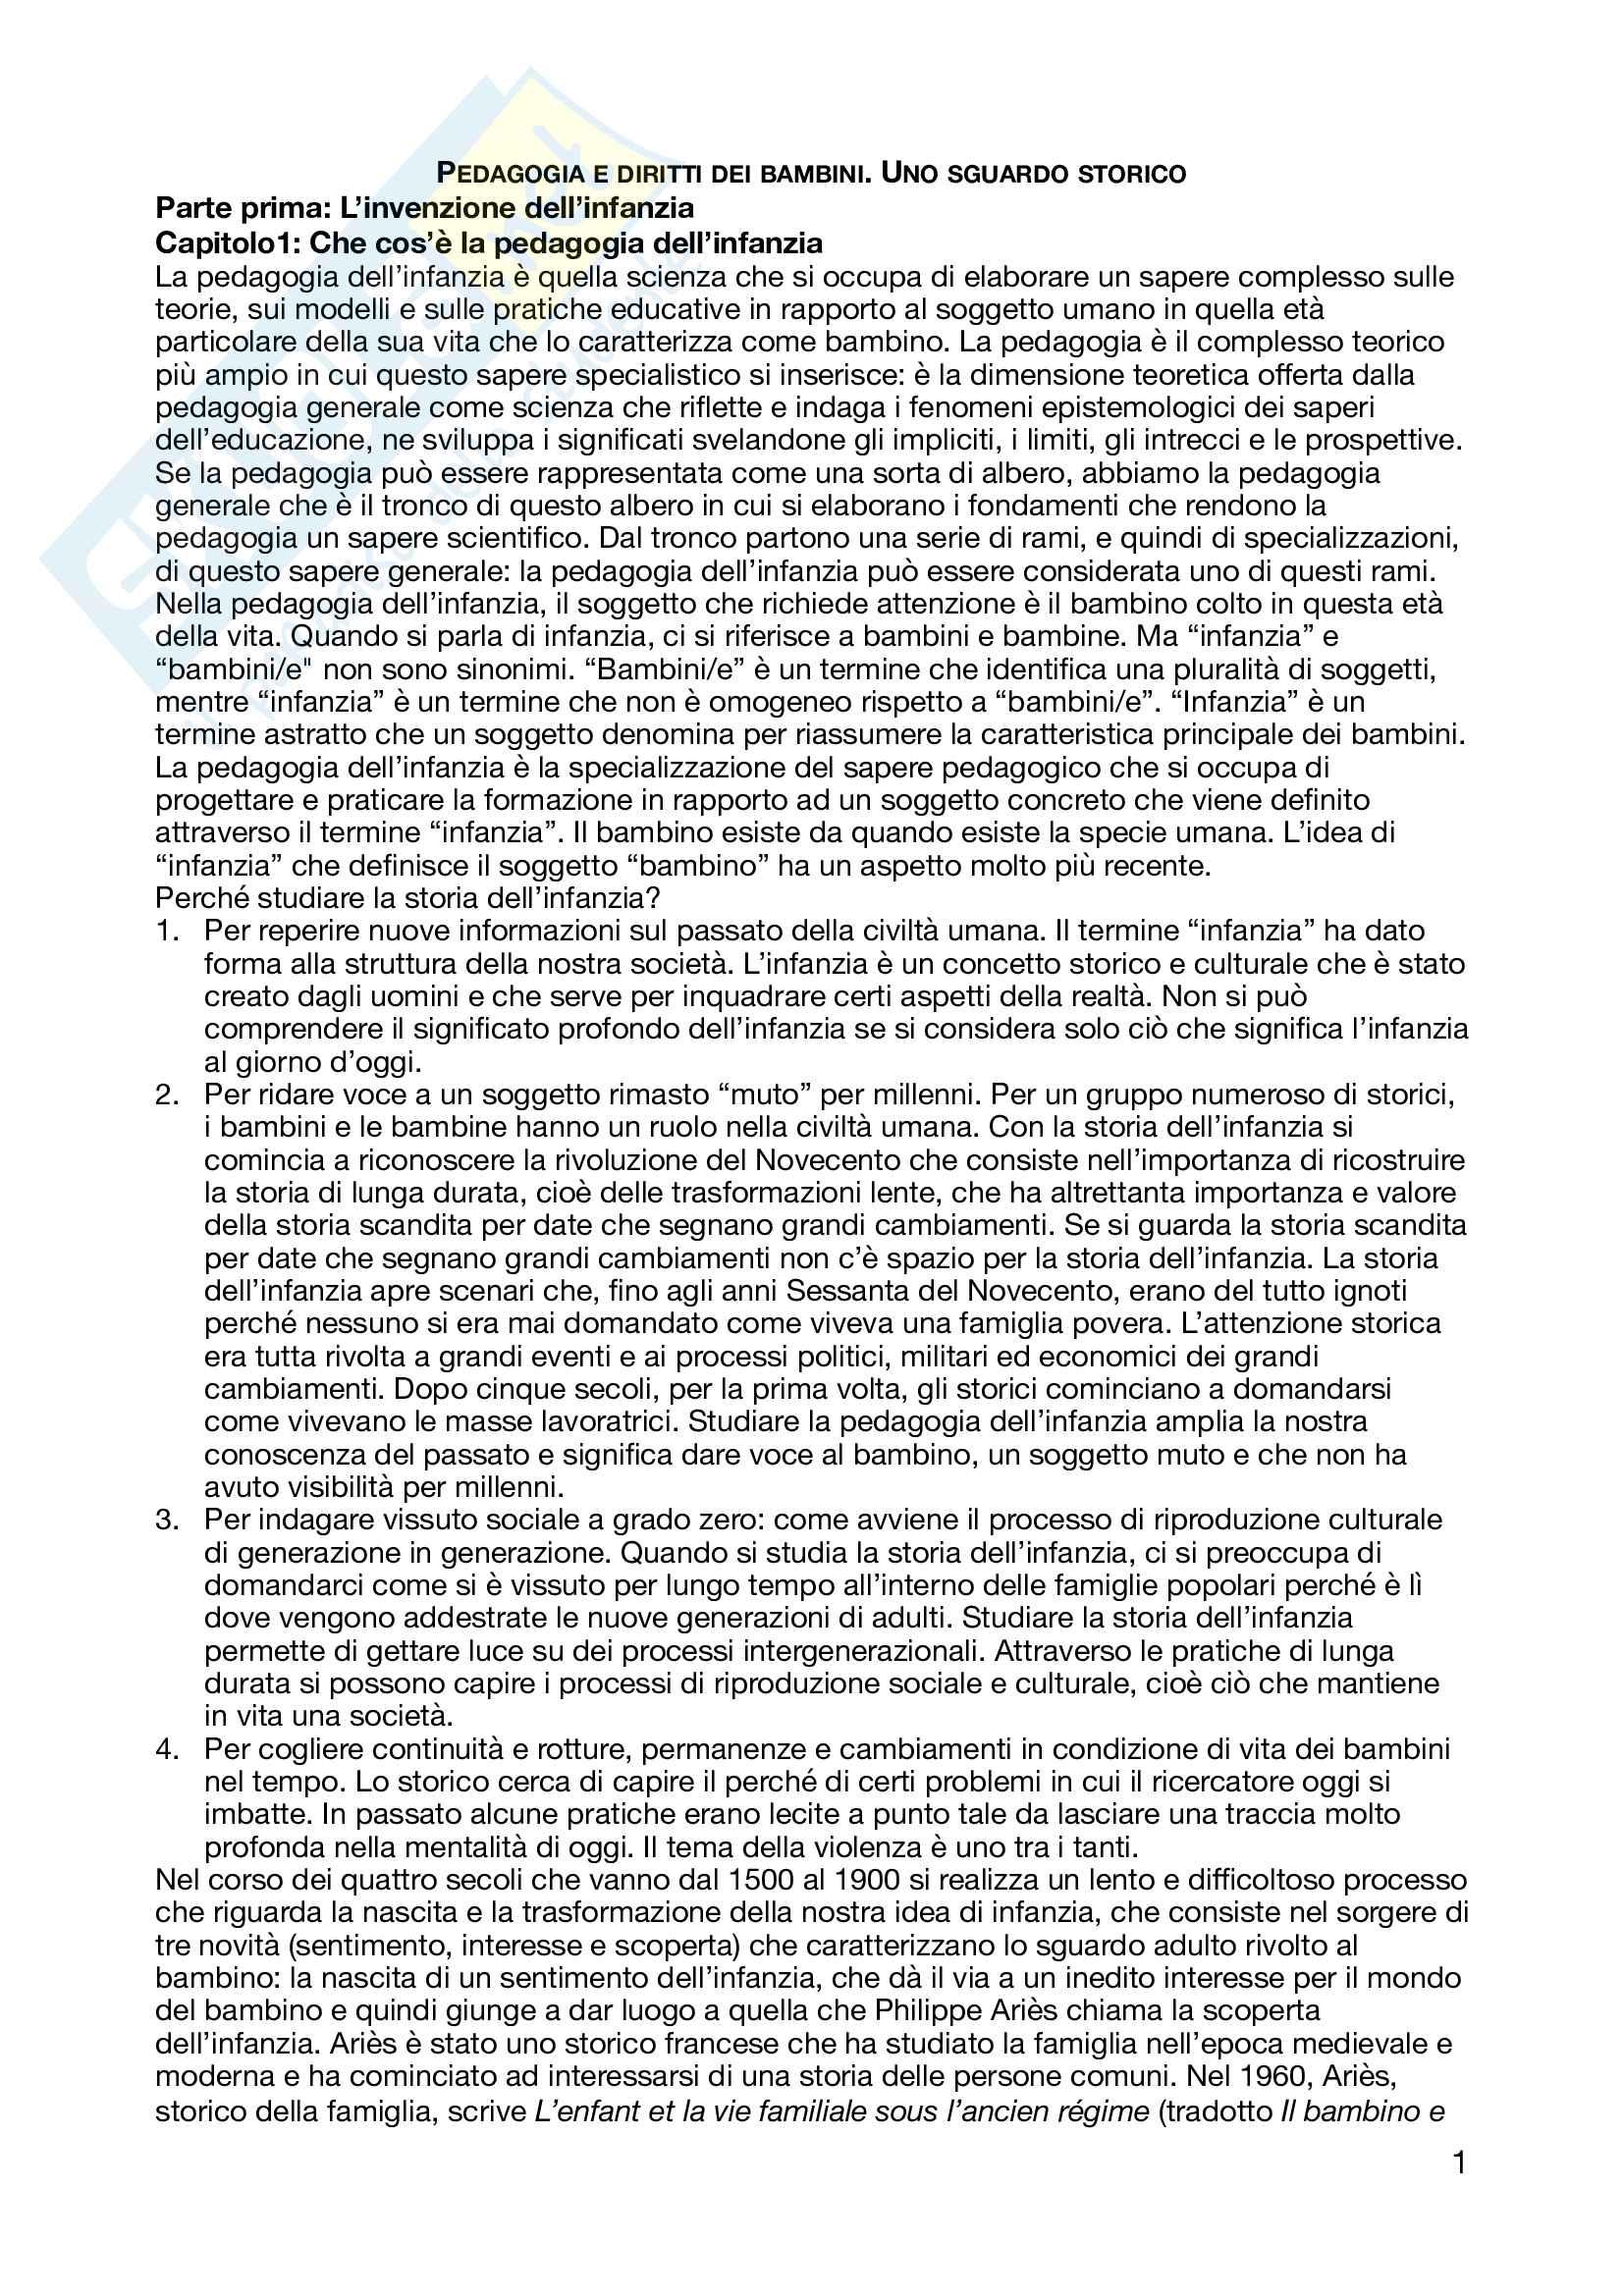 Riassunto esame pedagogia dell'infanzia, prof. Macinai, libro consigliato Pedagogia e diritti dei bambini. Uno sguardo storico, Macinai